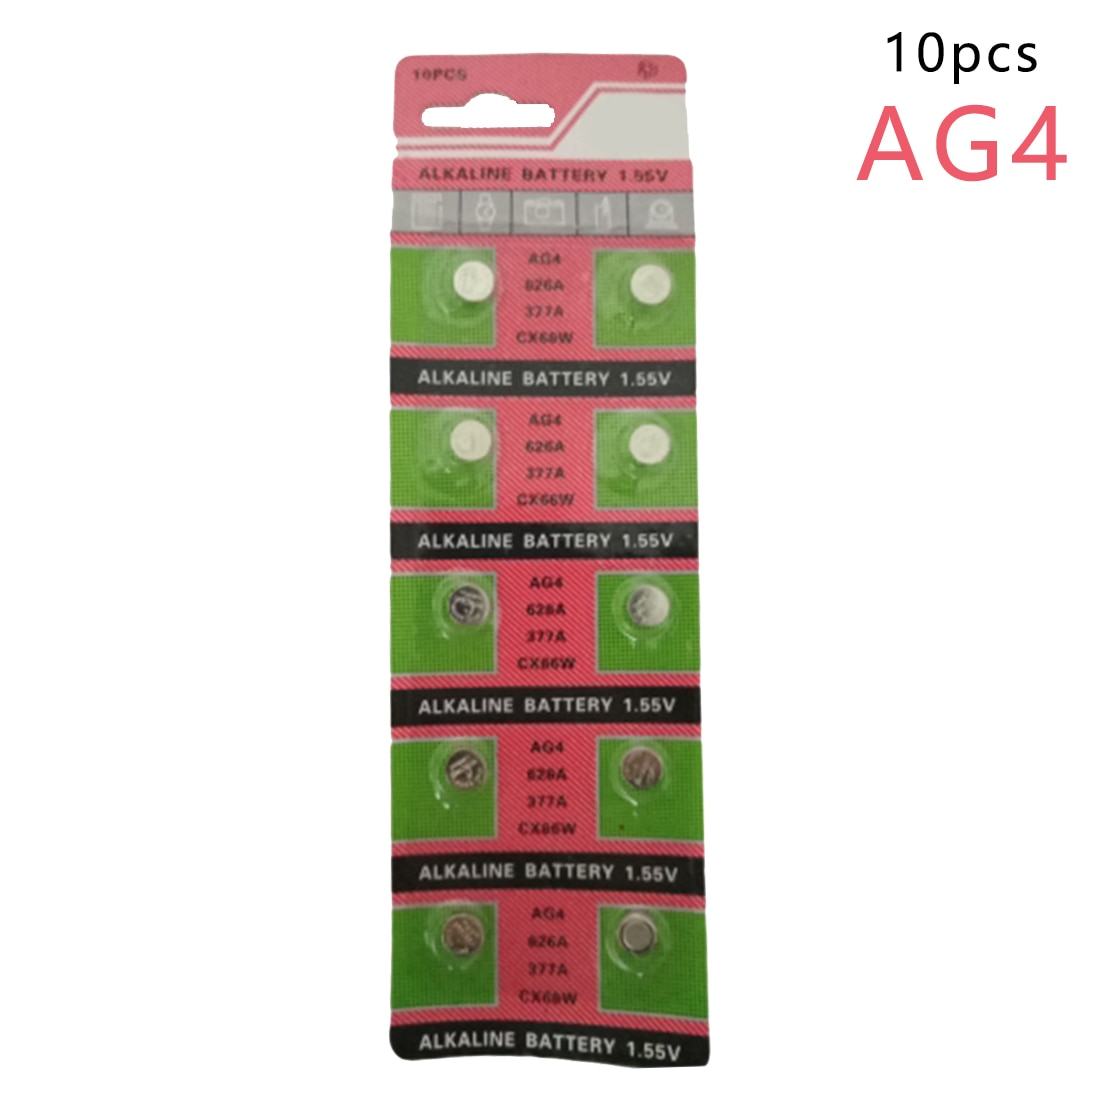 Centechia Hohe Qualität Großhandel 10 Teile/los = 1 karten AG4 377A 377 LR626 SR626SW SR66 LR66 taste zellen Uhr Münze batterie